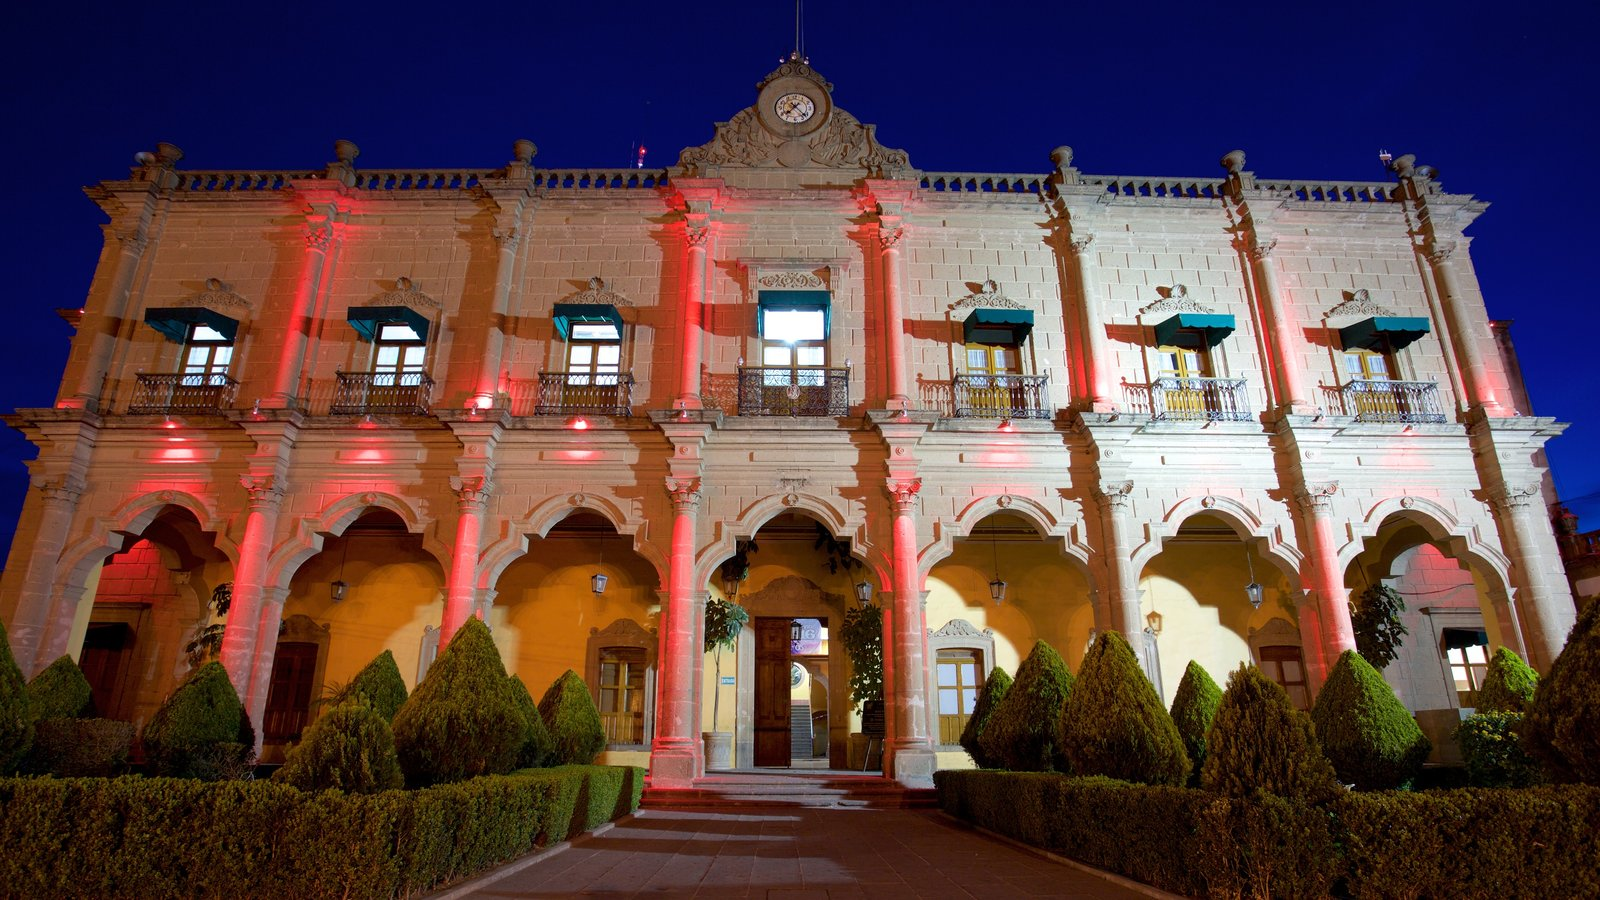 Huichapan caracterizando cenas noturnas e arquitetura de patrimônio